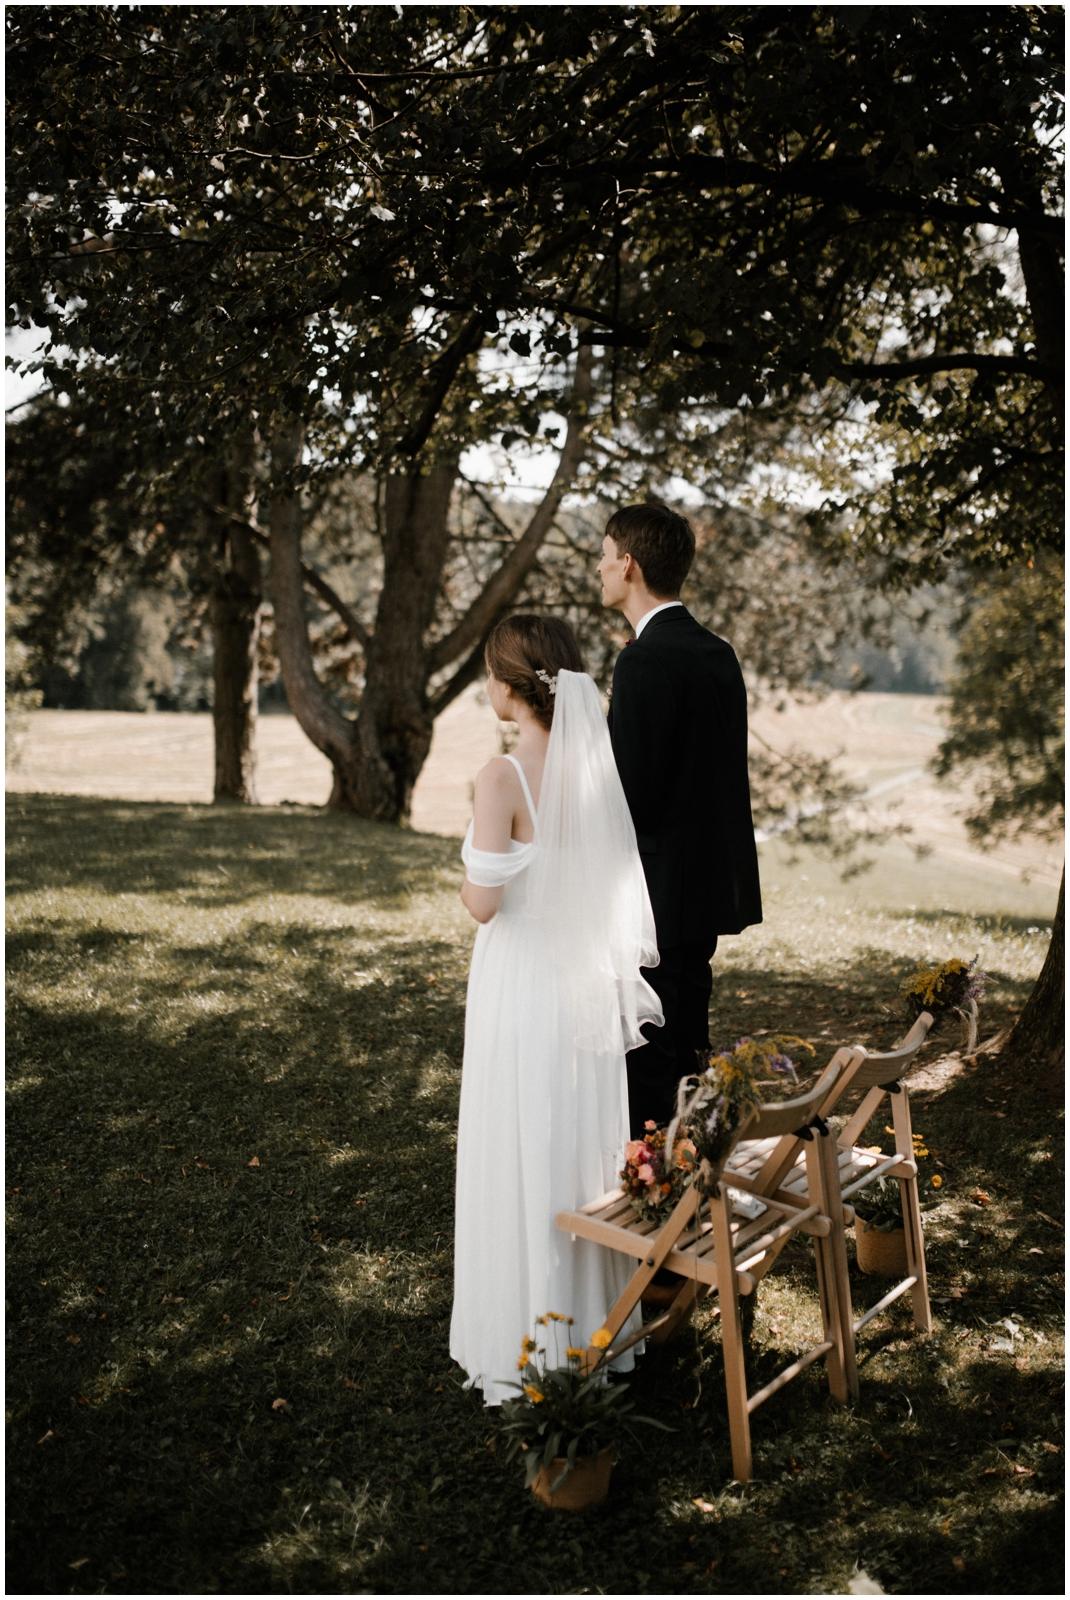 mirjam_thomas_wedding-350.jpg